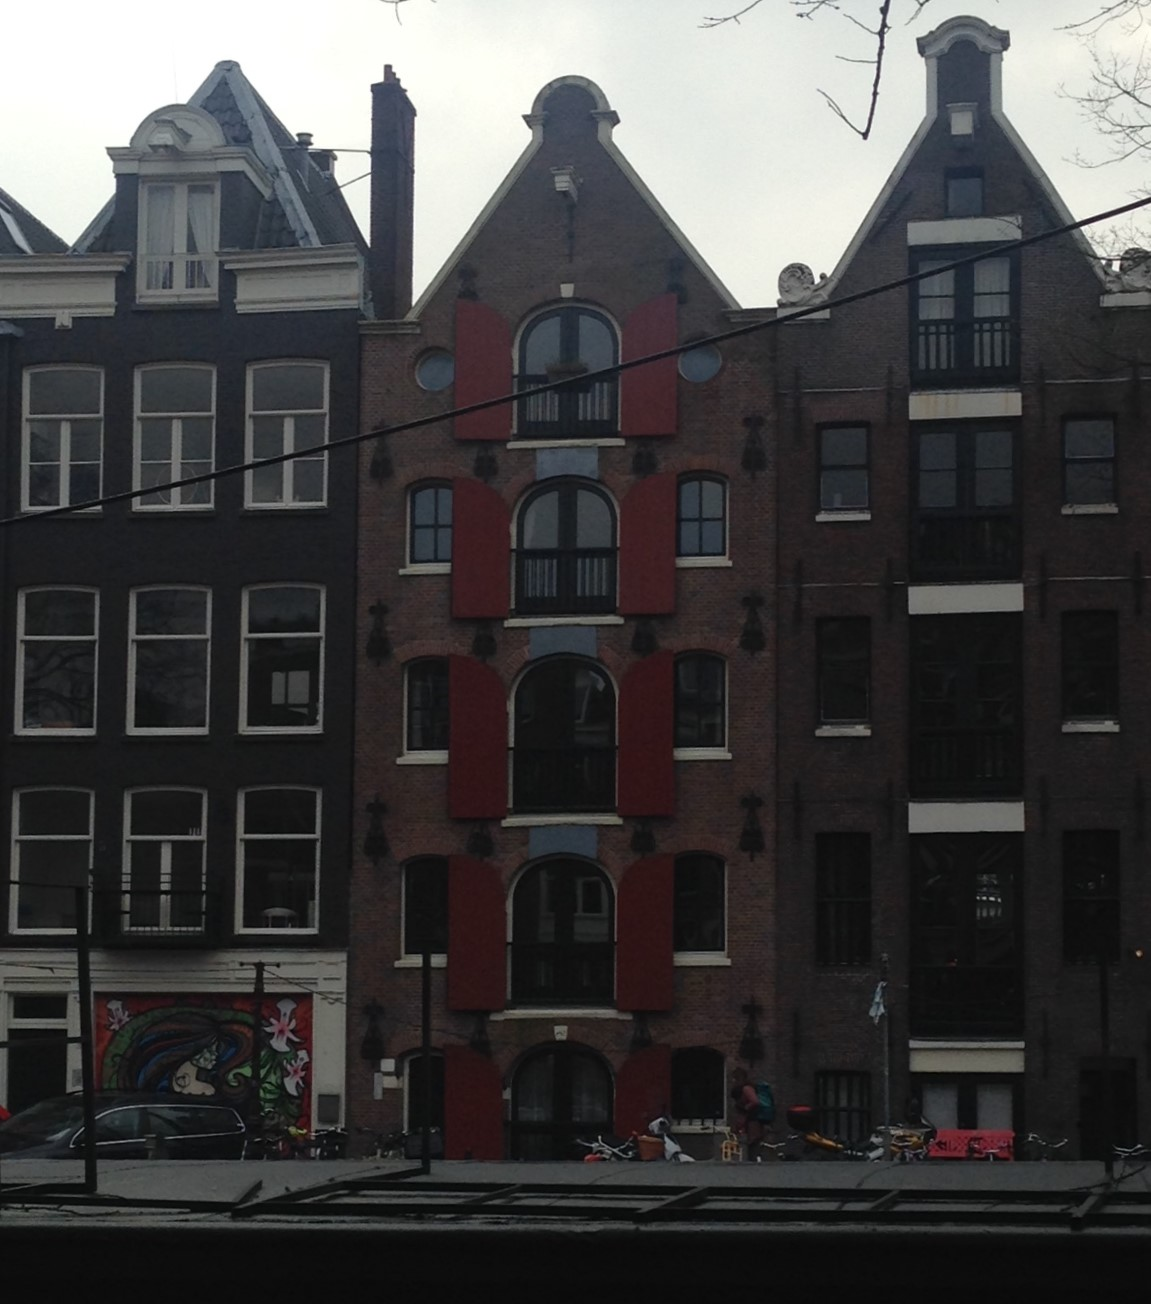 2016 Amsterdam building with windows 3.JPG